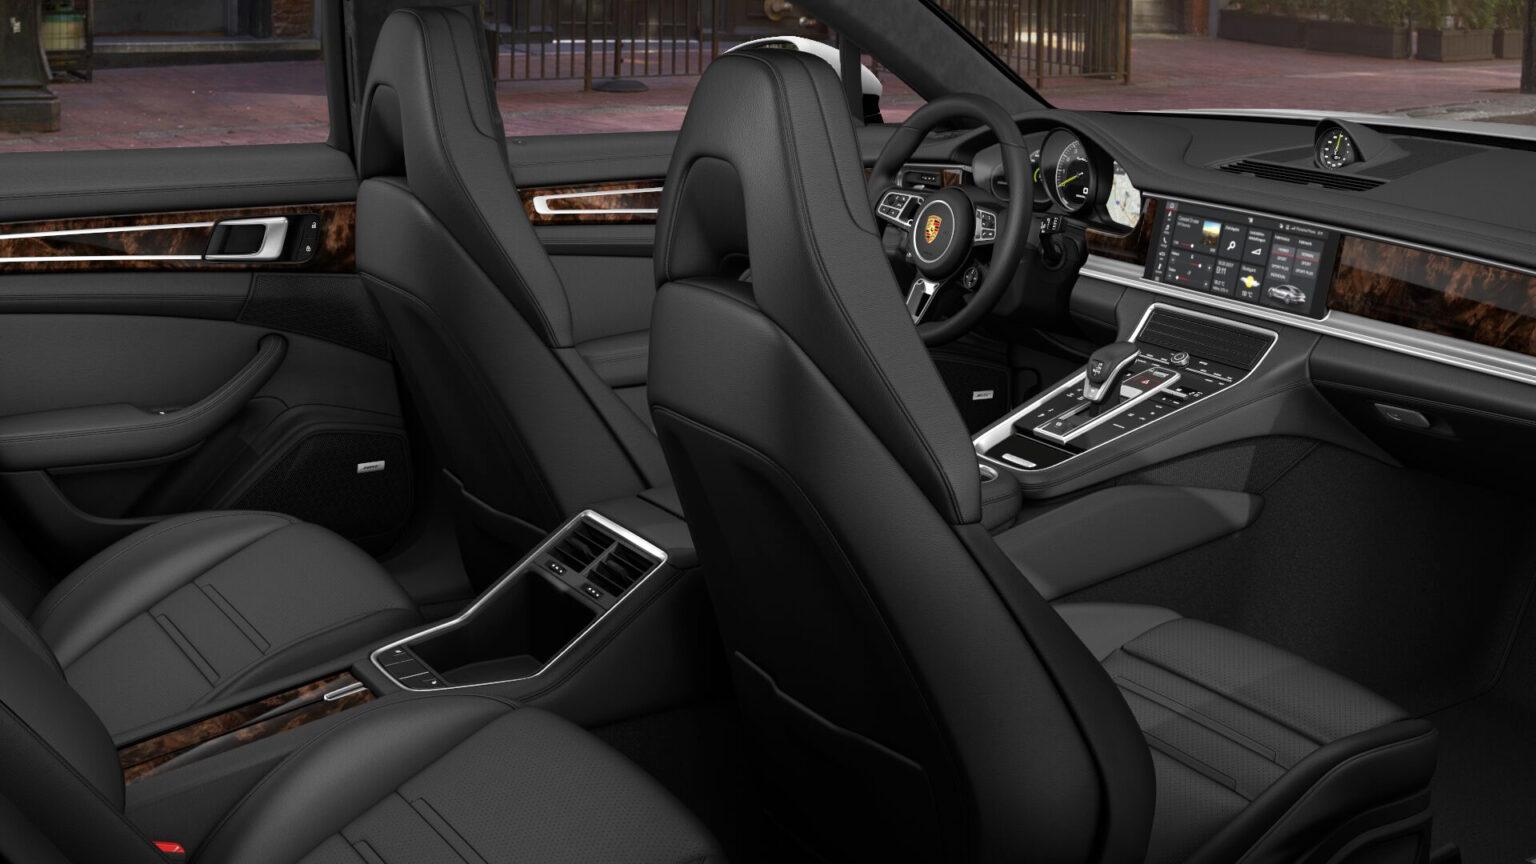 Porsche Panamera Turbo S E Hybrid Interior 03